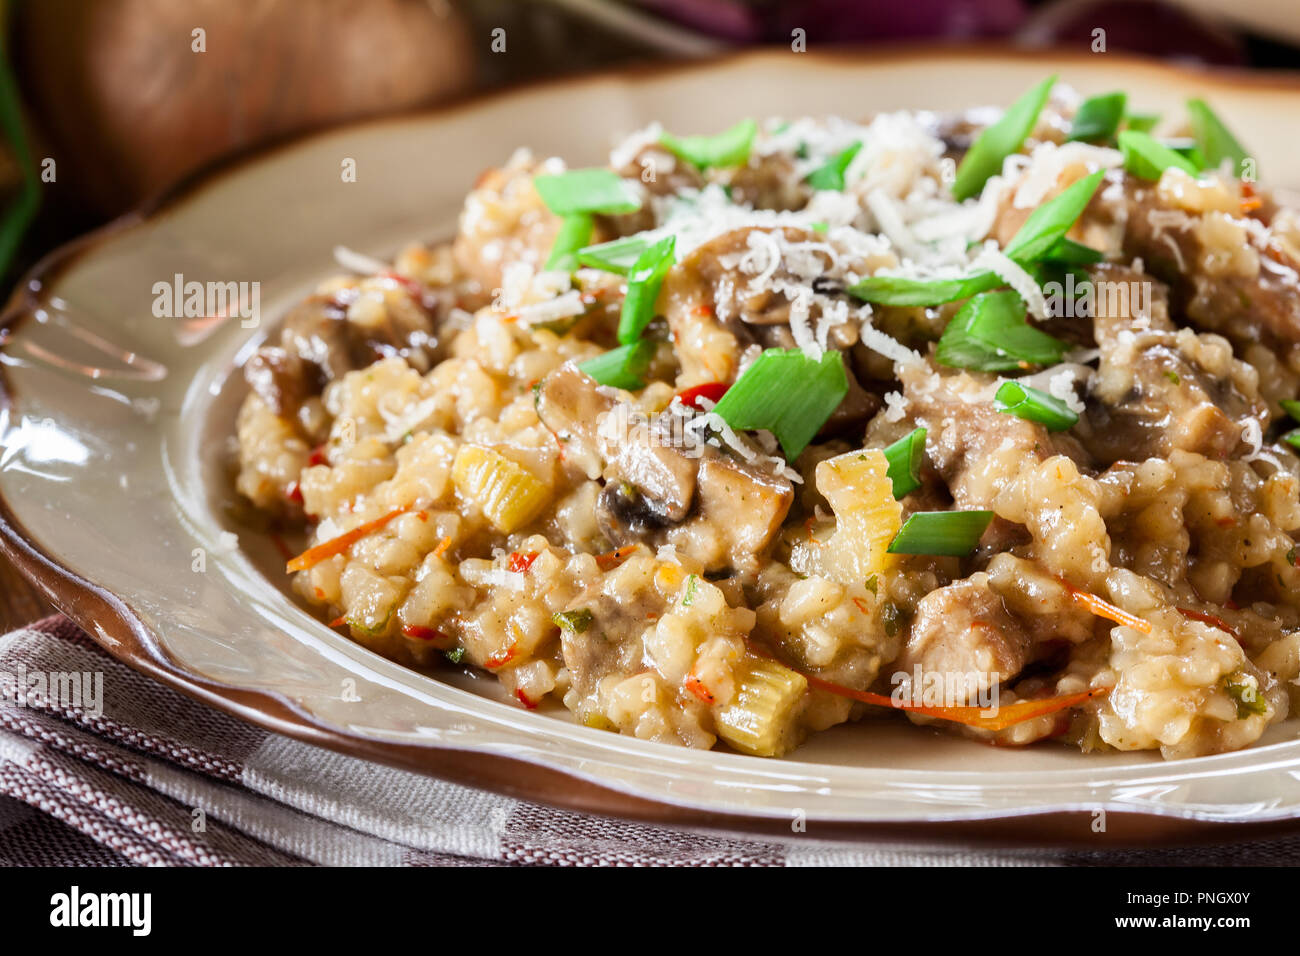 Risotto with champignon mushrooms, pork and parmesan. Italian cuisine - Stock Image